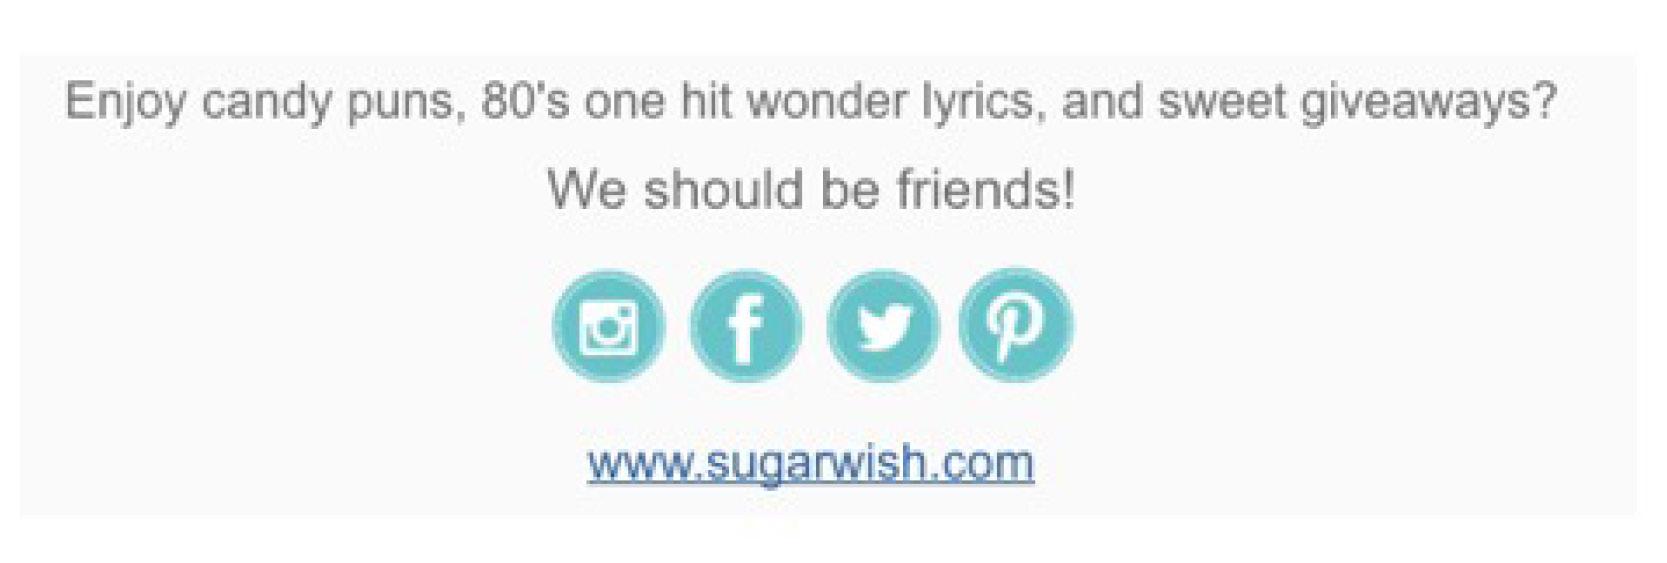 Sugarwish email bottom